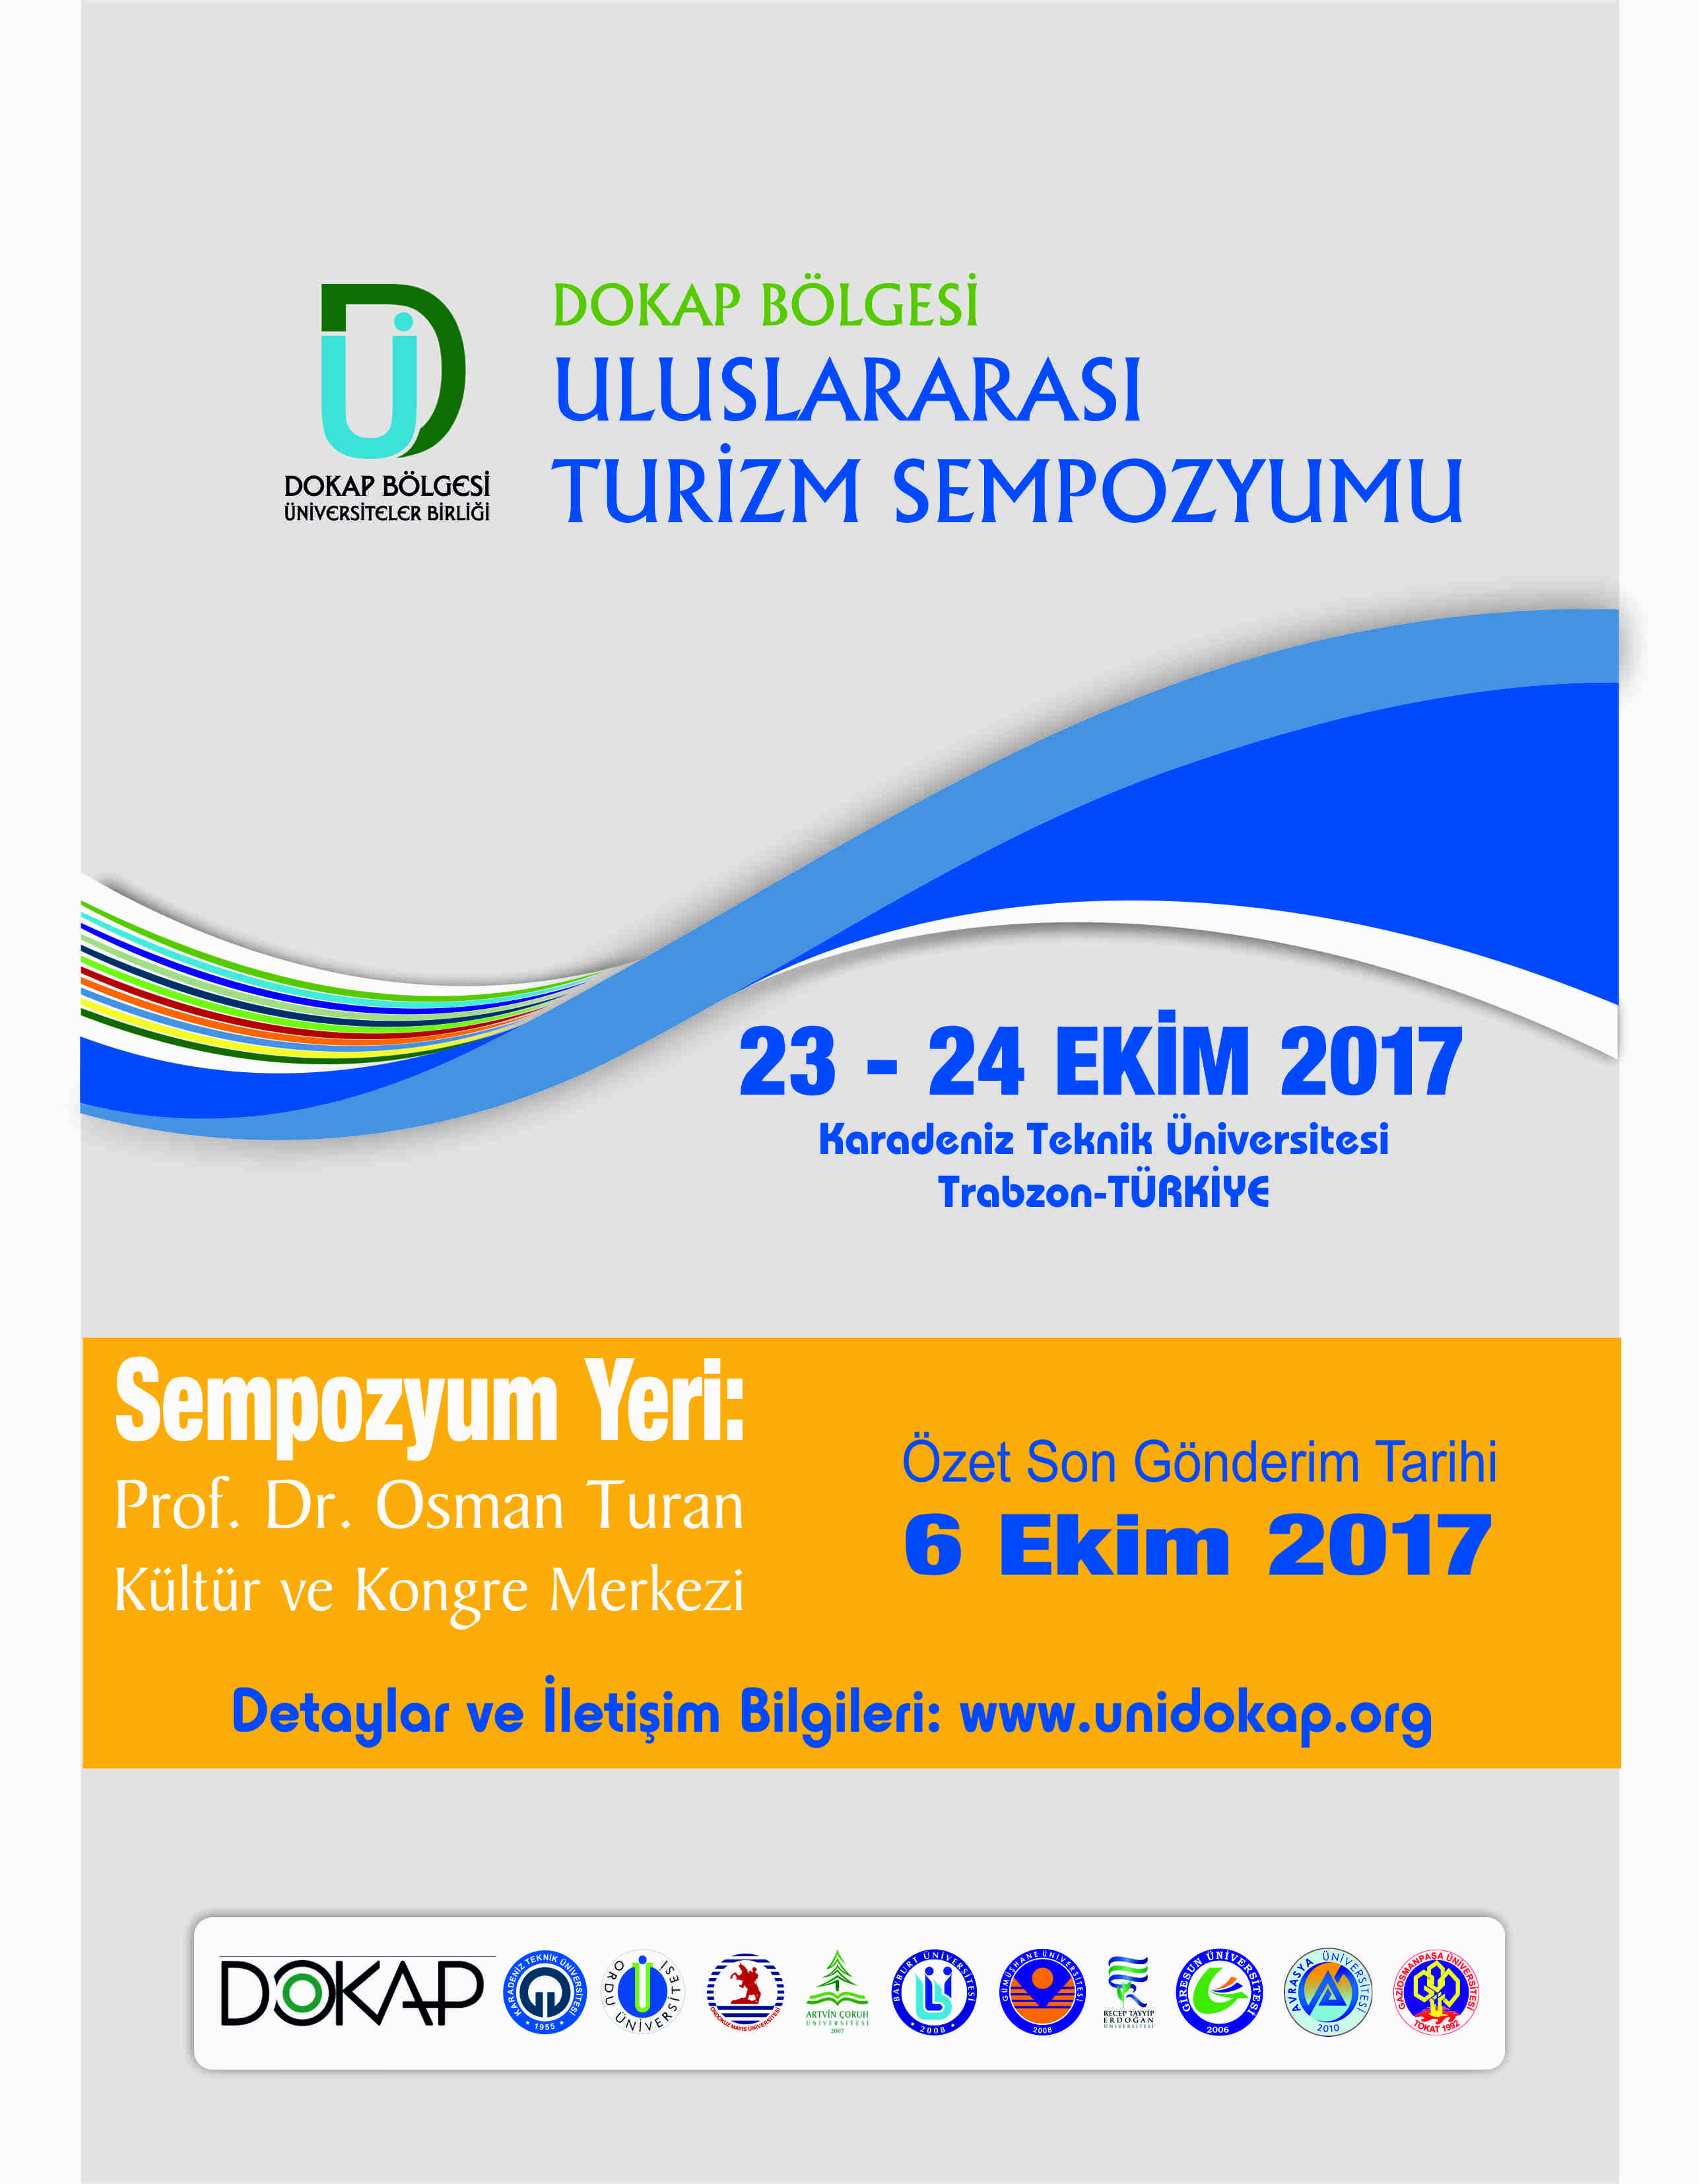 http://www.omu.edu.tr/sites/default/files/files/dokap_uluslararasi_turizm_sempozyumu/dokap.jpg